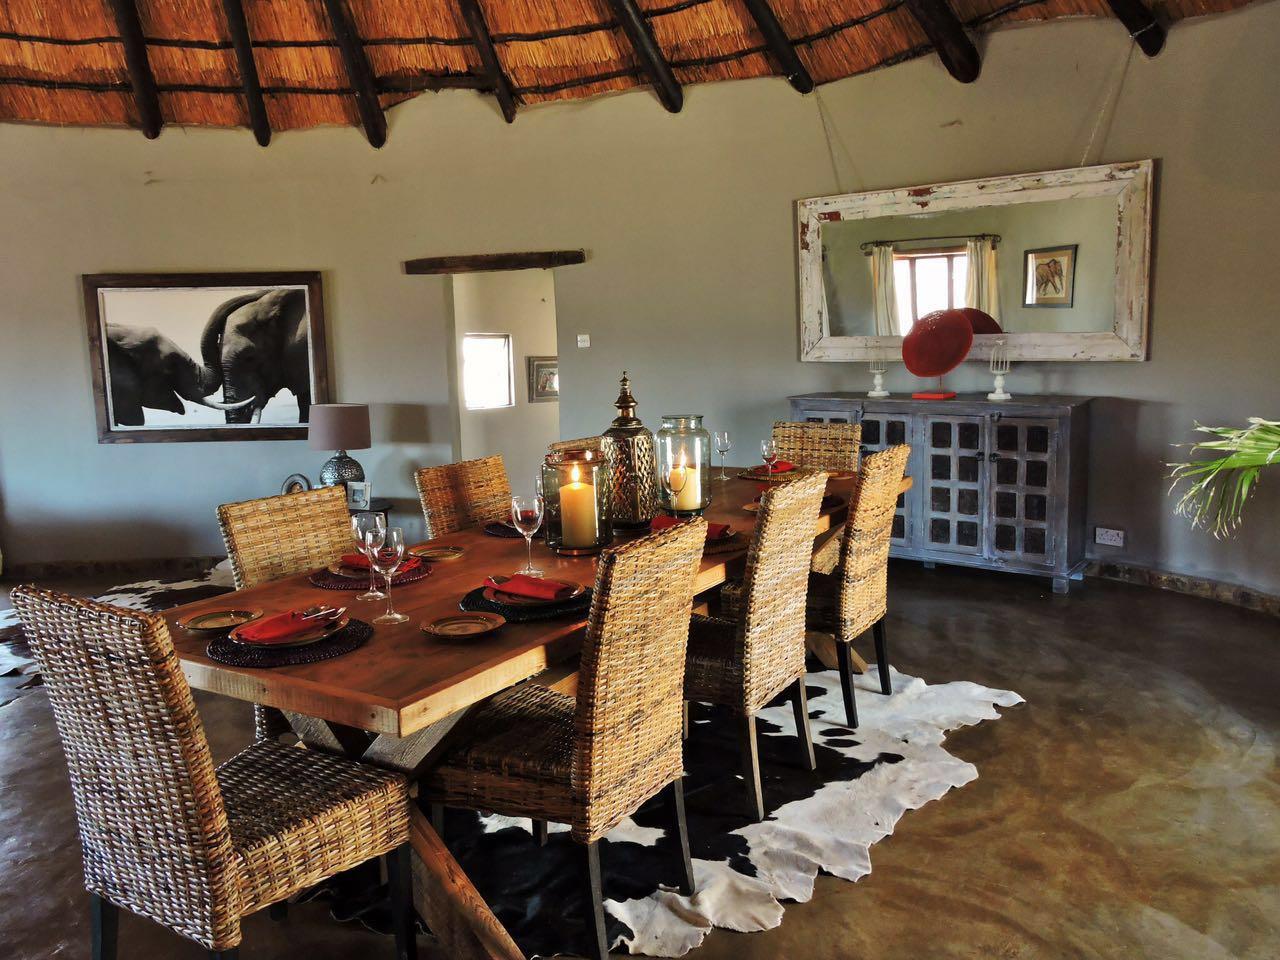 The Amalinda Home-Stead